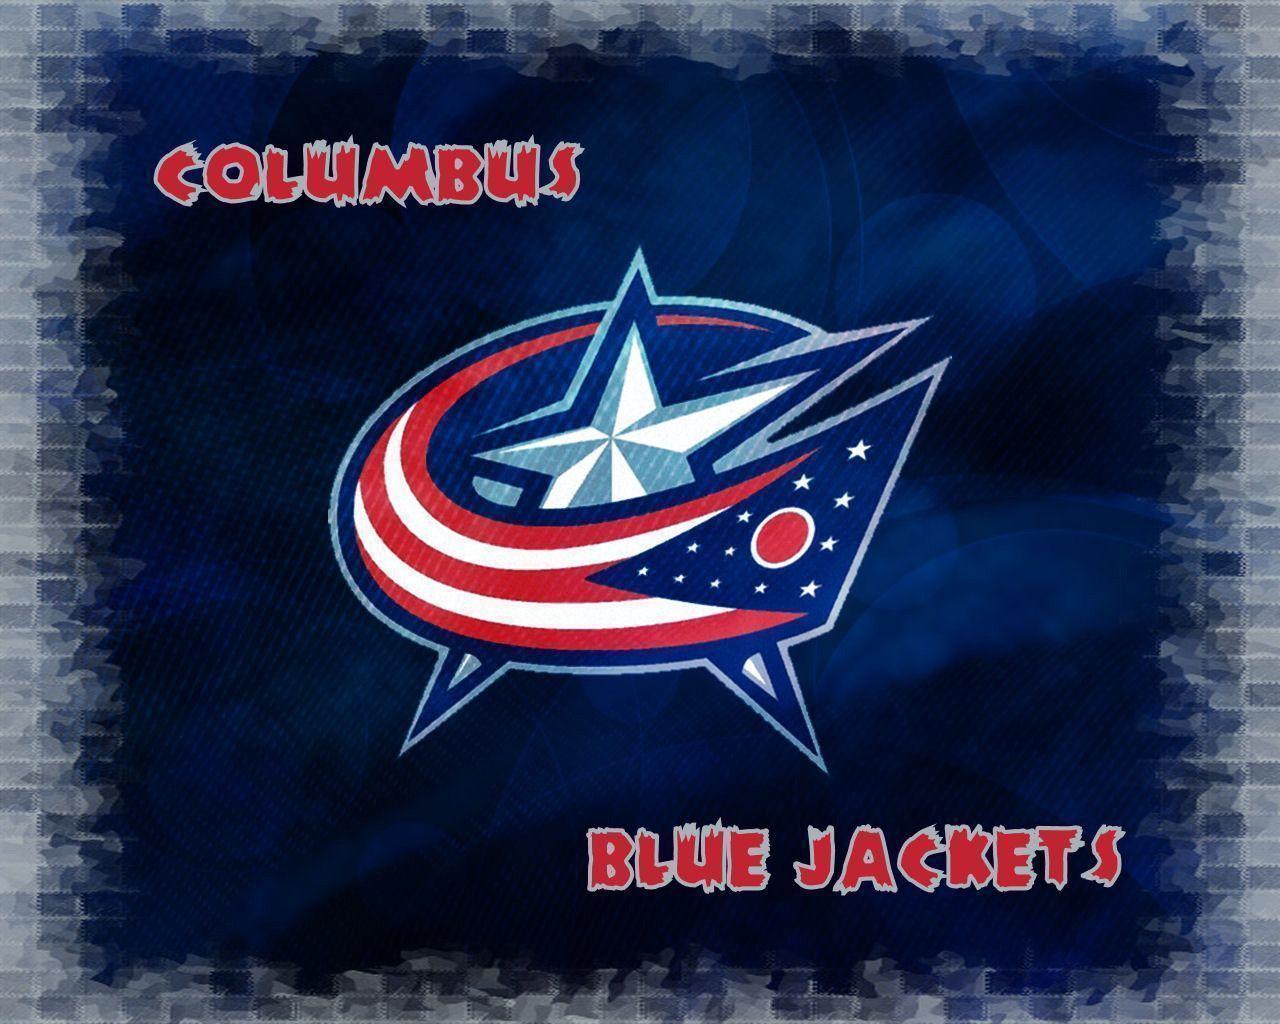 Columbus Blue Jackets (NHL) TV Listings   TV Guide